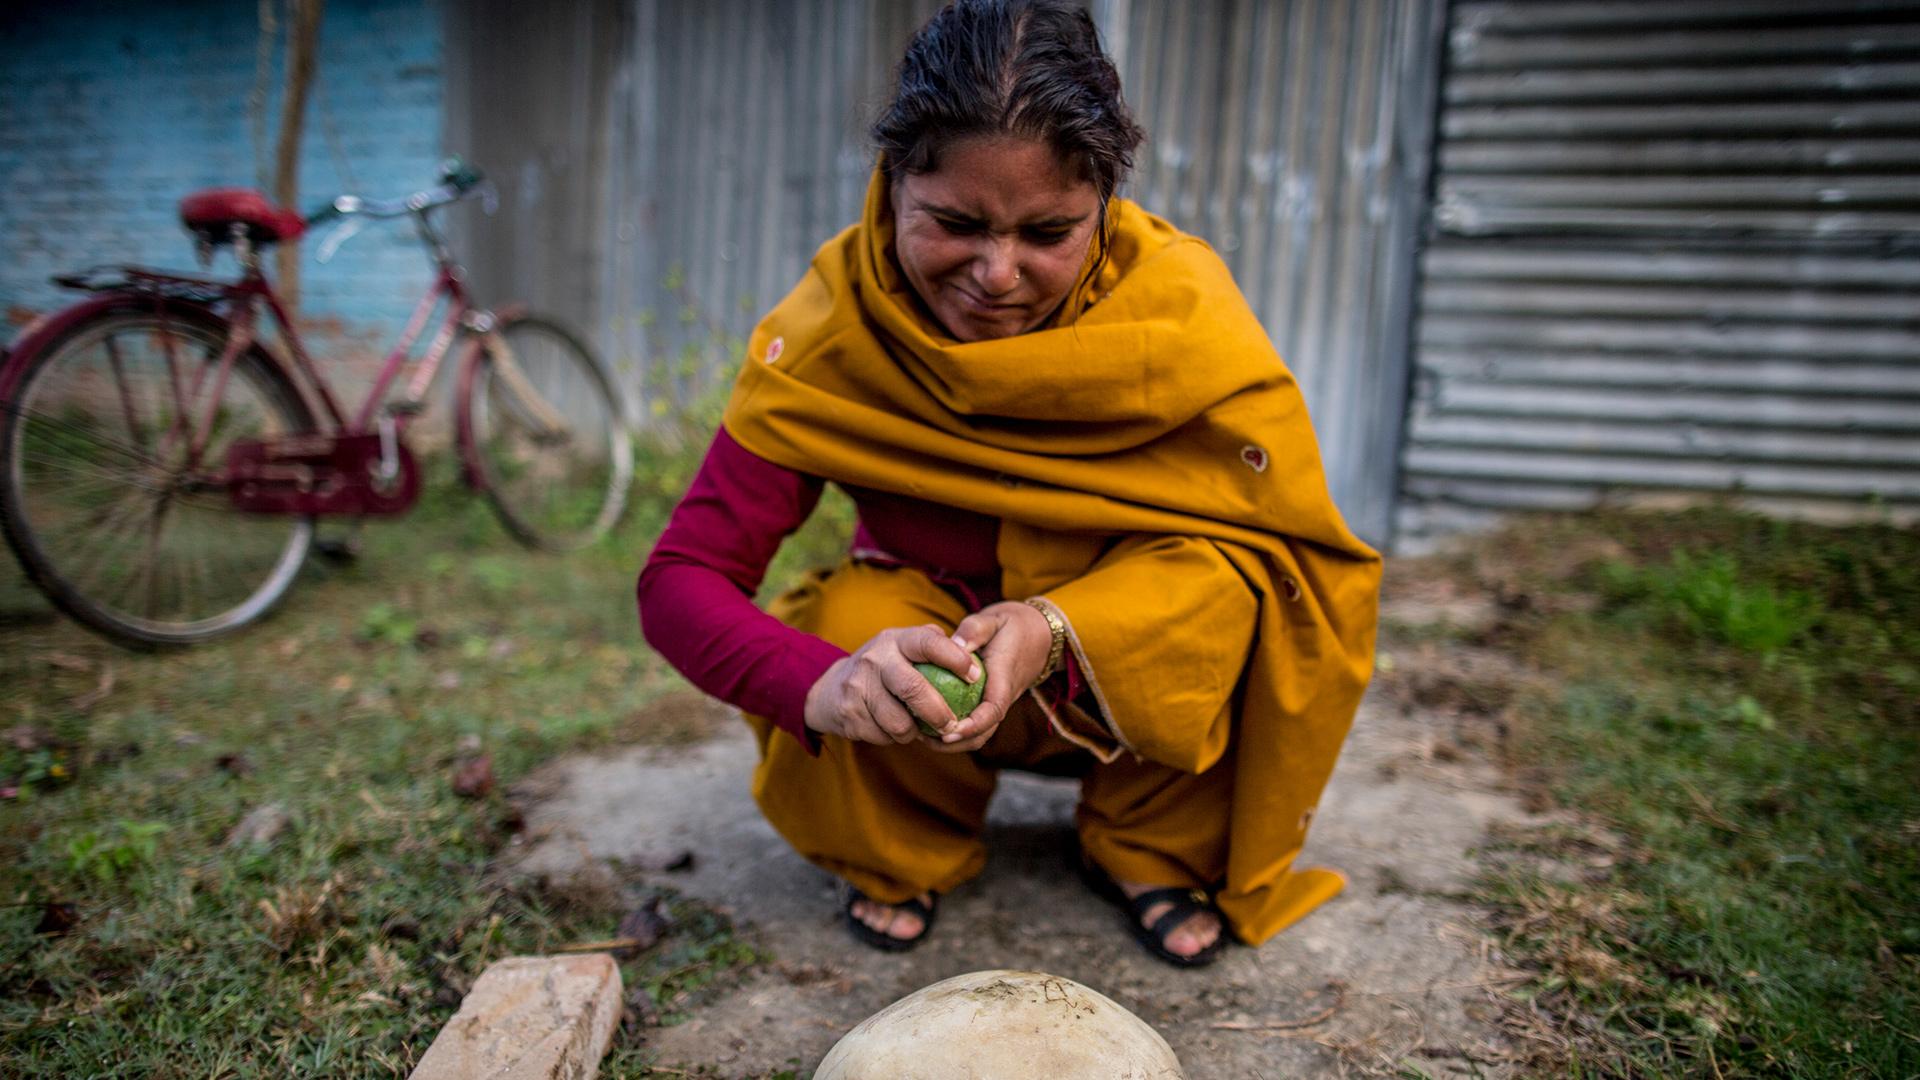 Frauen in Nepal: Maya Yogi vor der Saftfrabrik im Khata Korridor